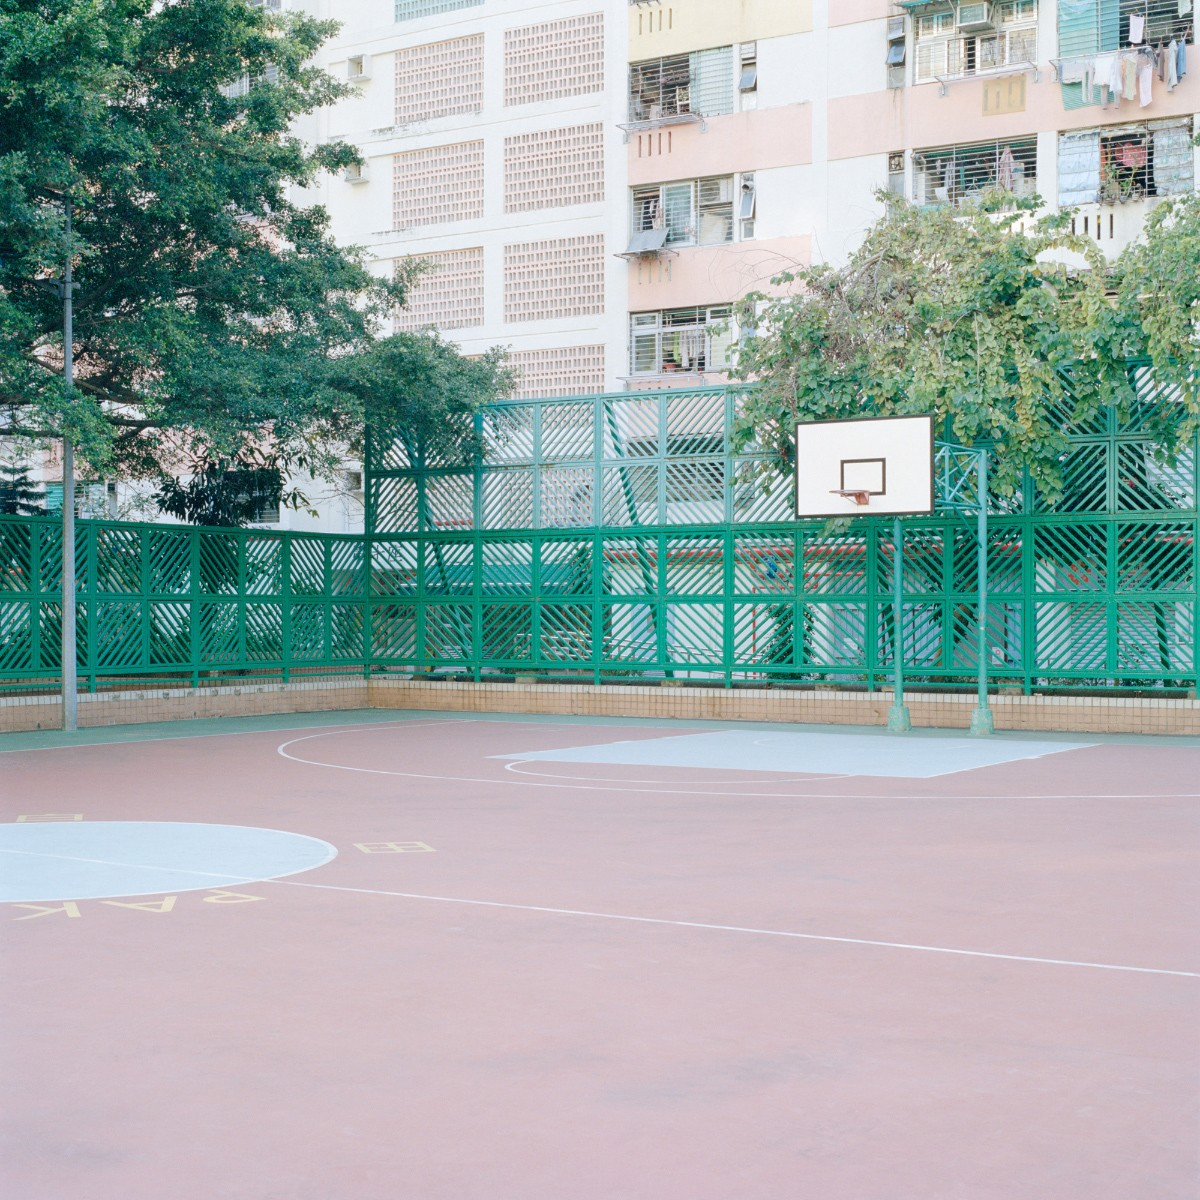 ward-roberts-courts-02.4-0910d74dae3e04402e8336f70a1567c1.jpg